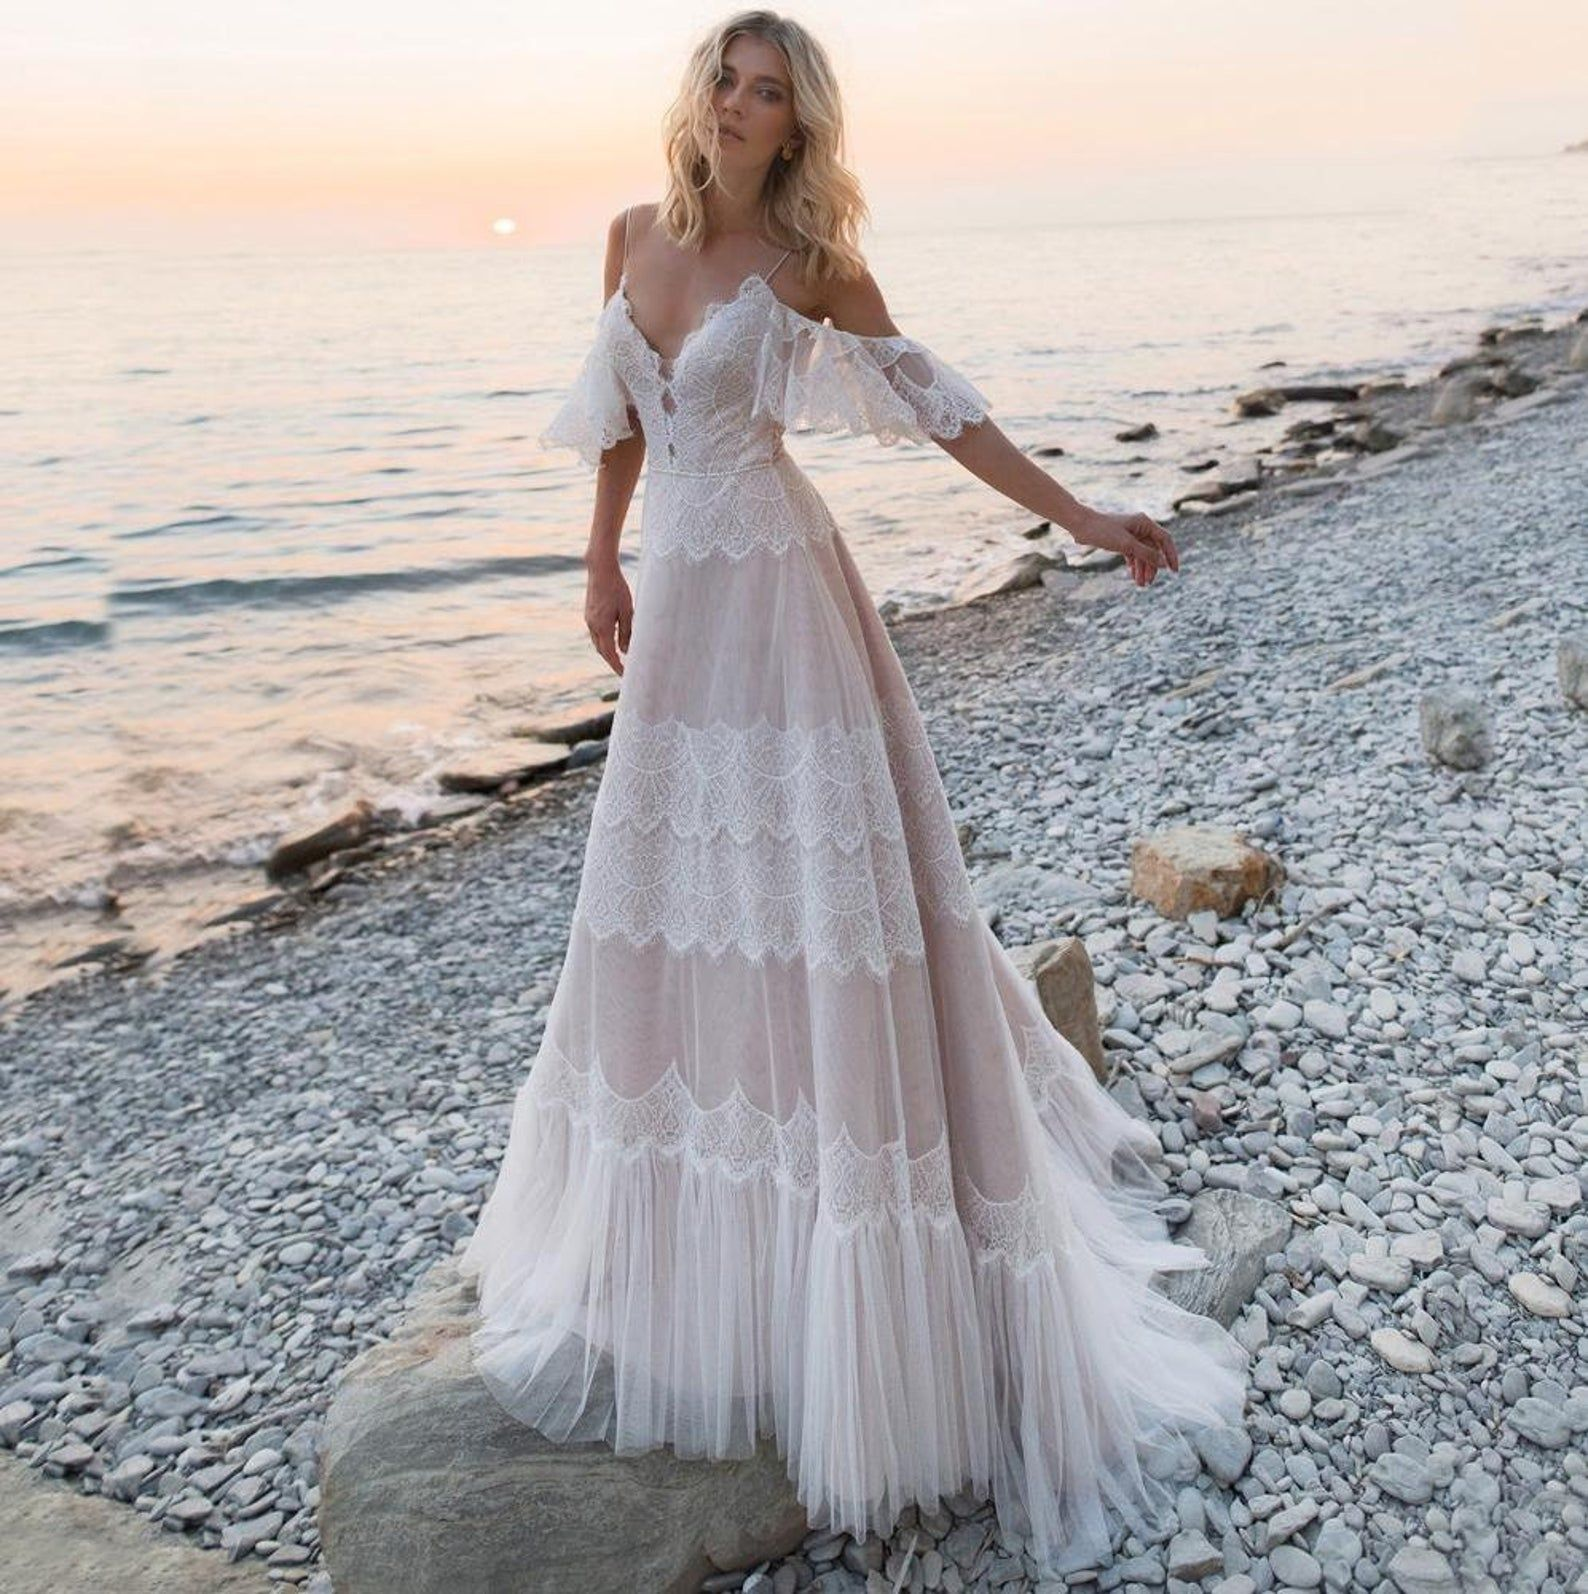 Spaghetti Straps Backless Lace Boho Wedding Dresses Etsy In 2020 Boho Wedding Dress Etsy Backless Bridal Gowns Boho Wedding Dress Lace